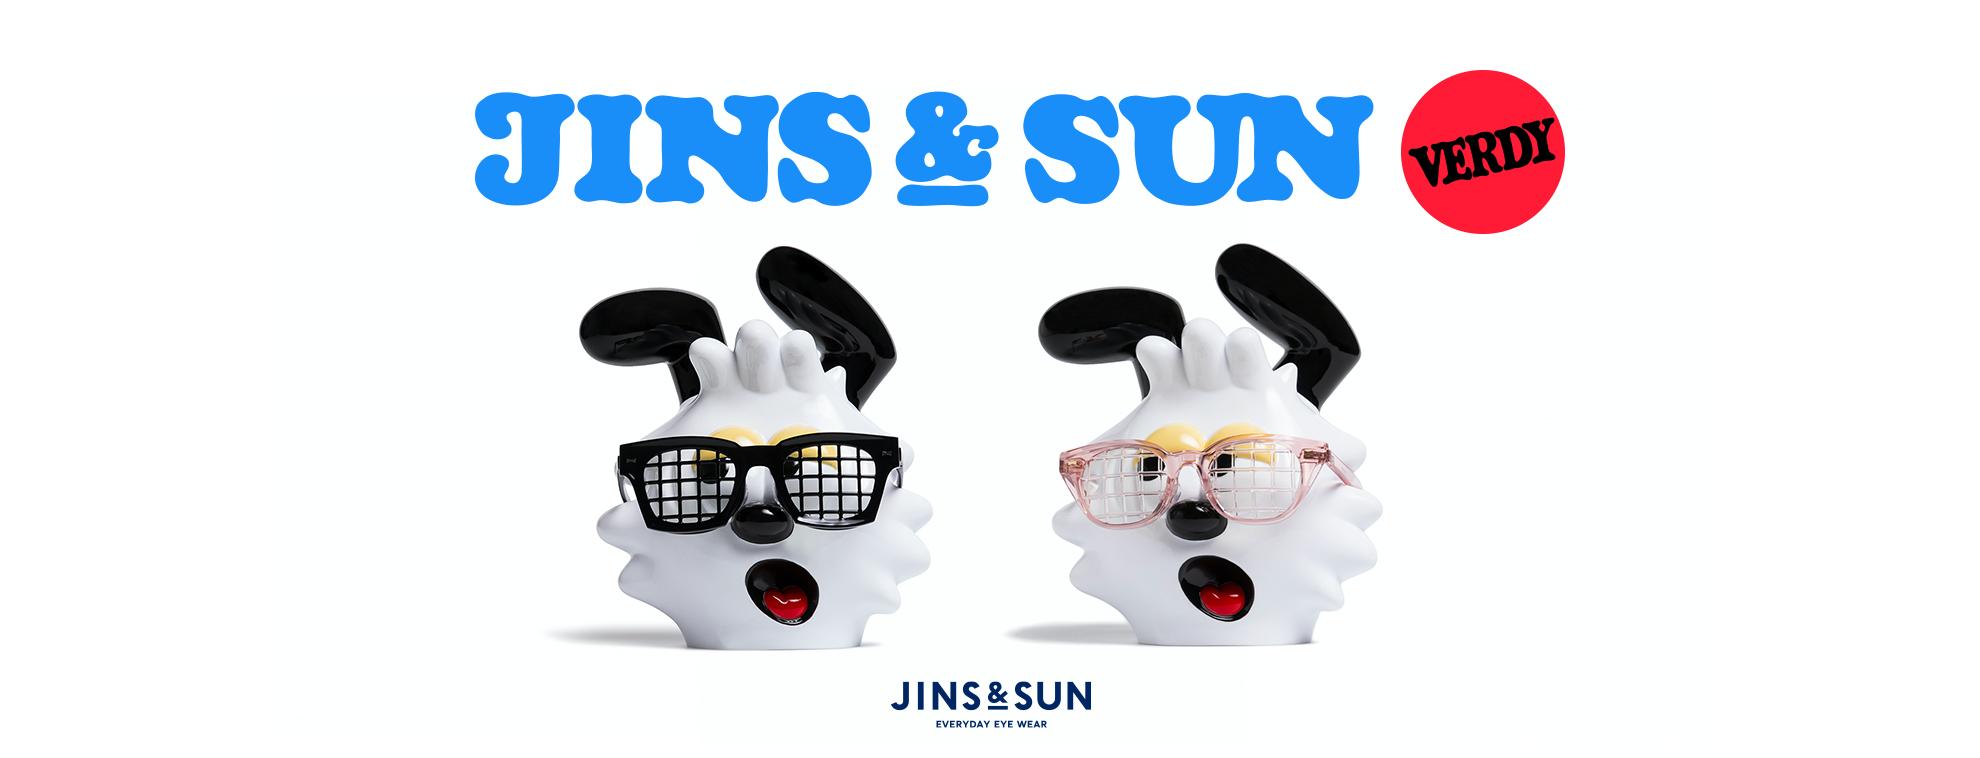 JINS&SUN×VERDY(ジンズ アンド サン×ヴェルディ)1